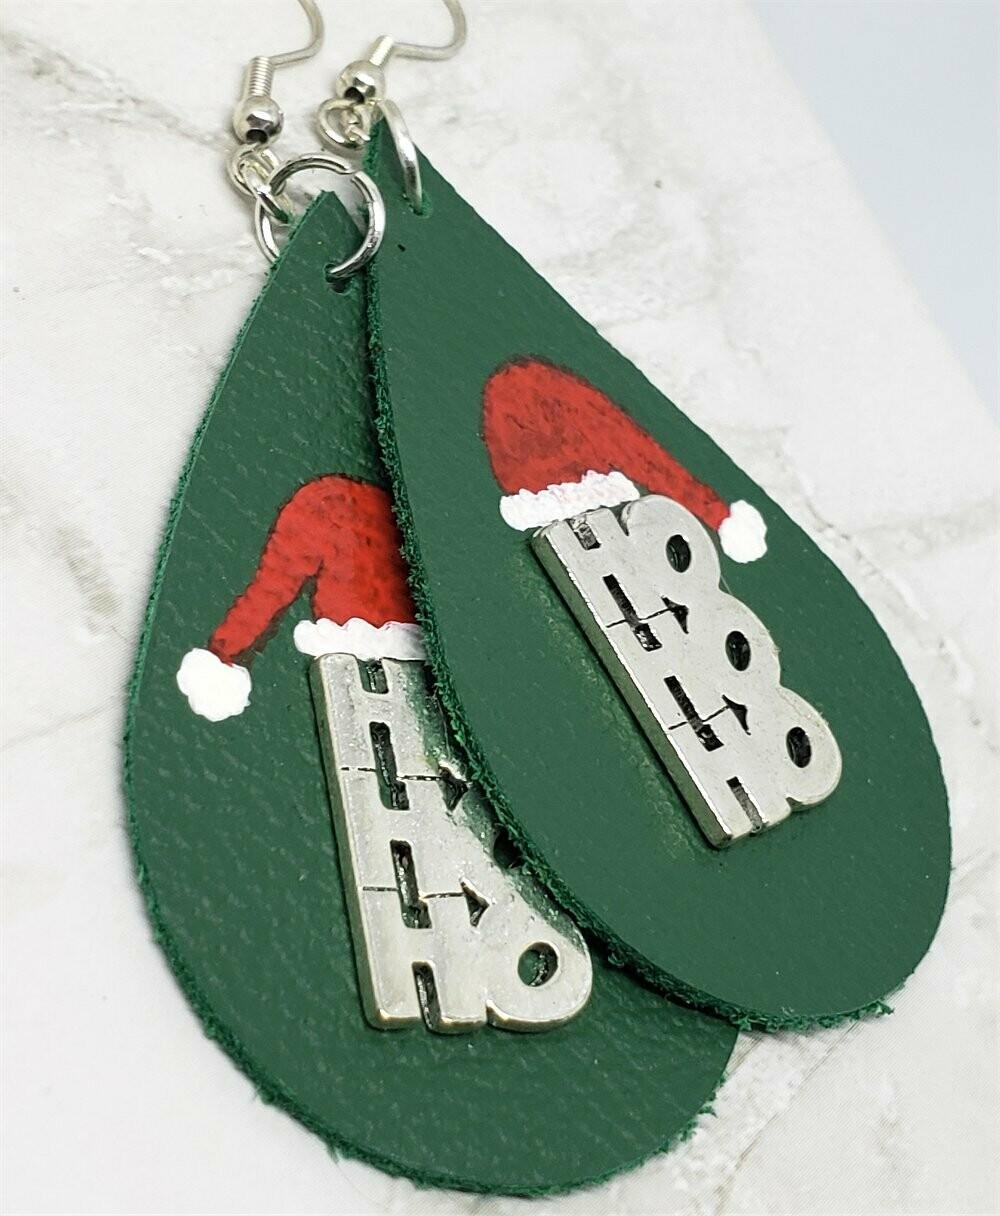 Hand Painted Santa Hat with Metal HoHoHo Embellishment on Green Real Leather Teardrop Shaped Earrings